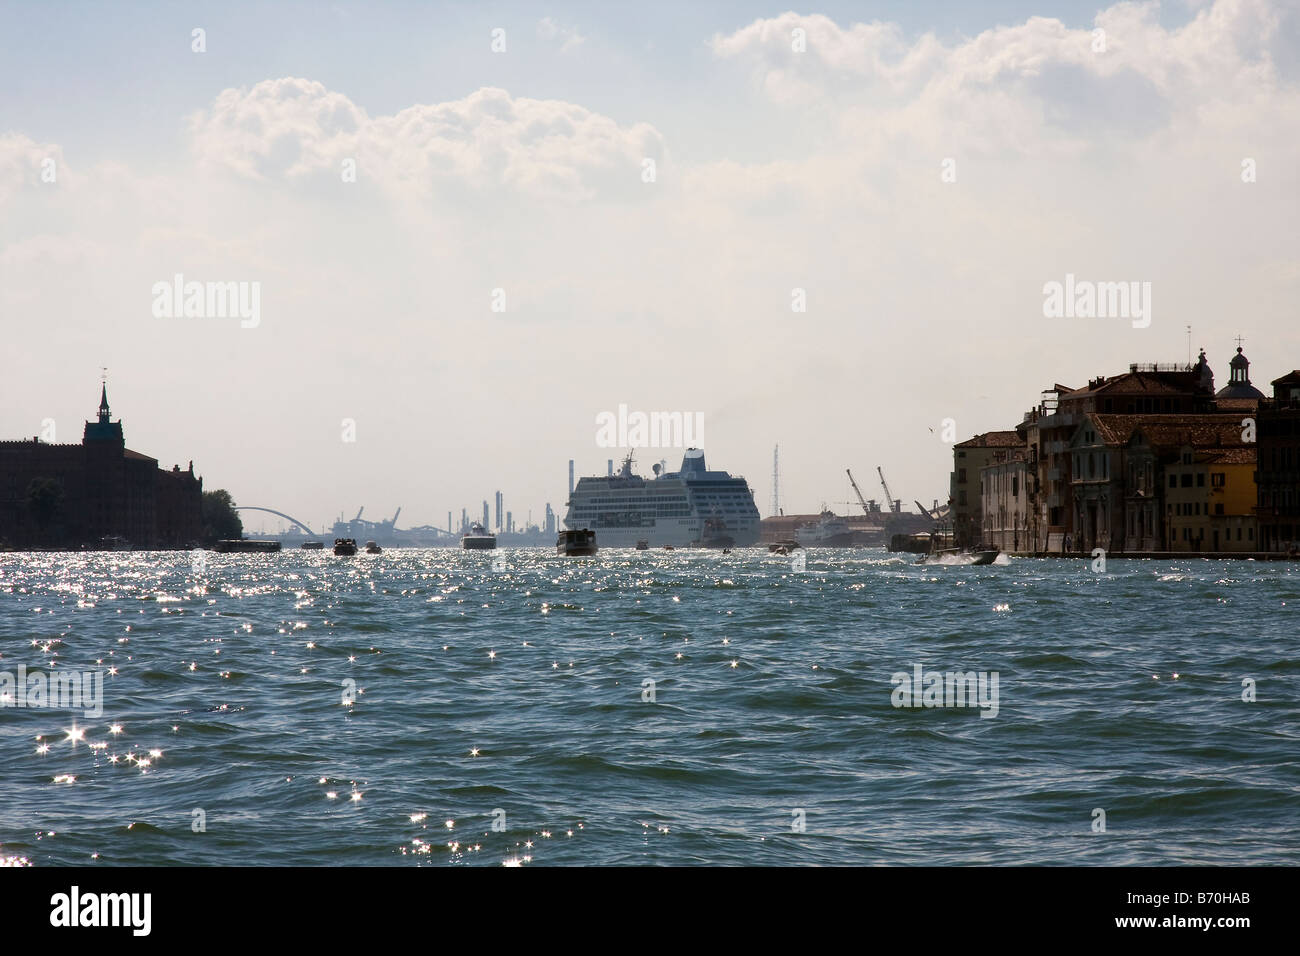 view from Giudecca looking west towards Bacino Stazione Maritima, Venice, Italy - Stock Image